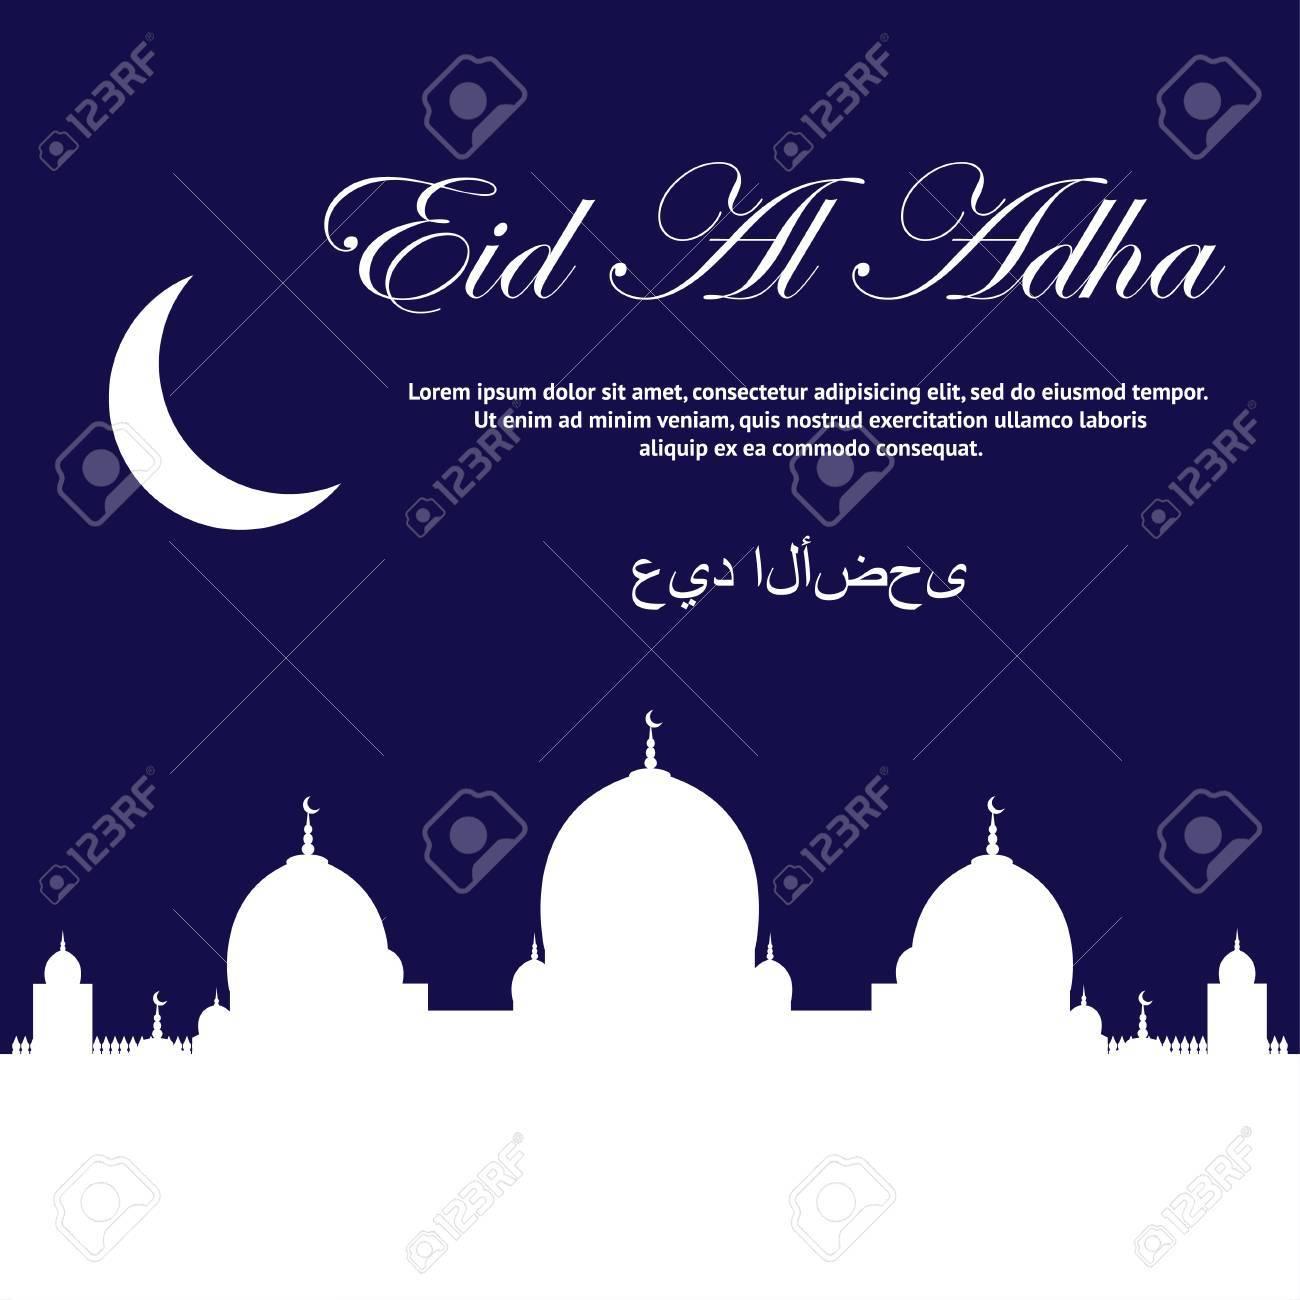 Background template of eid al adha mubarak muslim greeting card background template of eid al adha mubarak muslim greeting card design vector illustration stock vector kristyandbryce Images